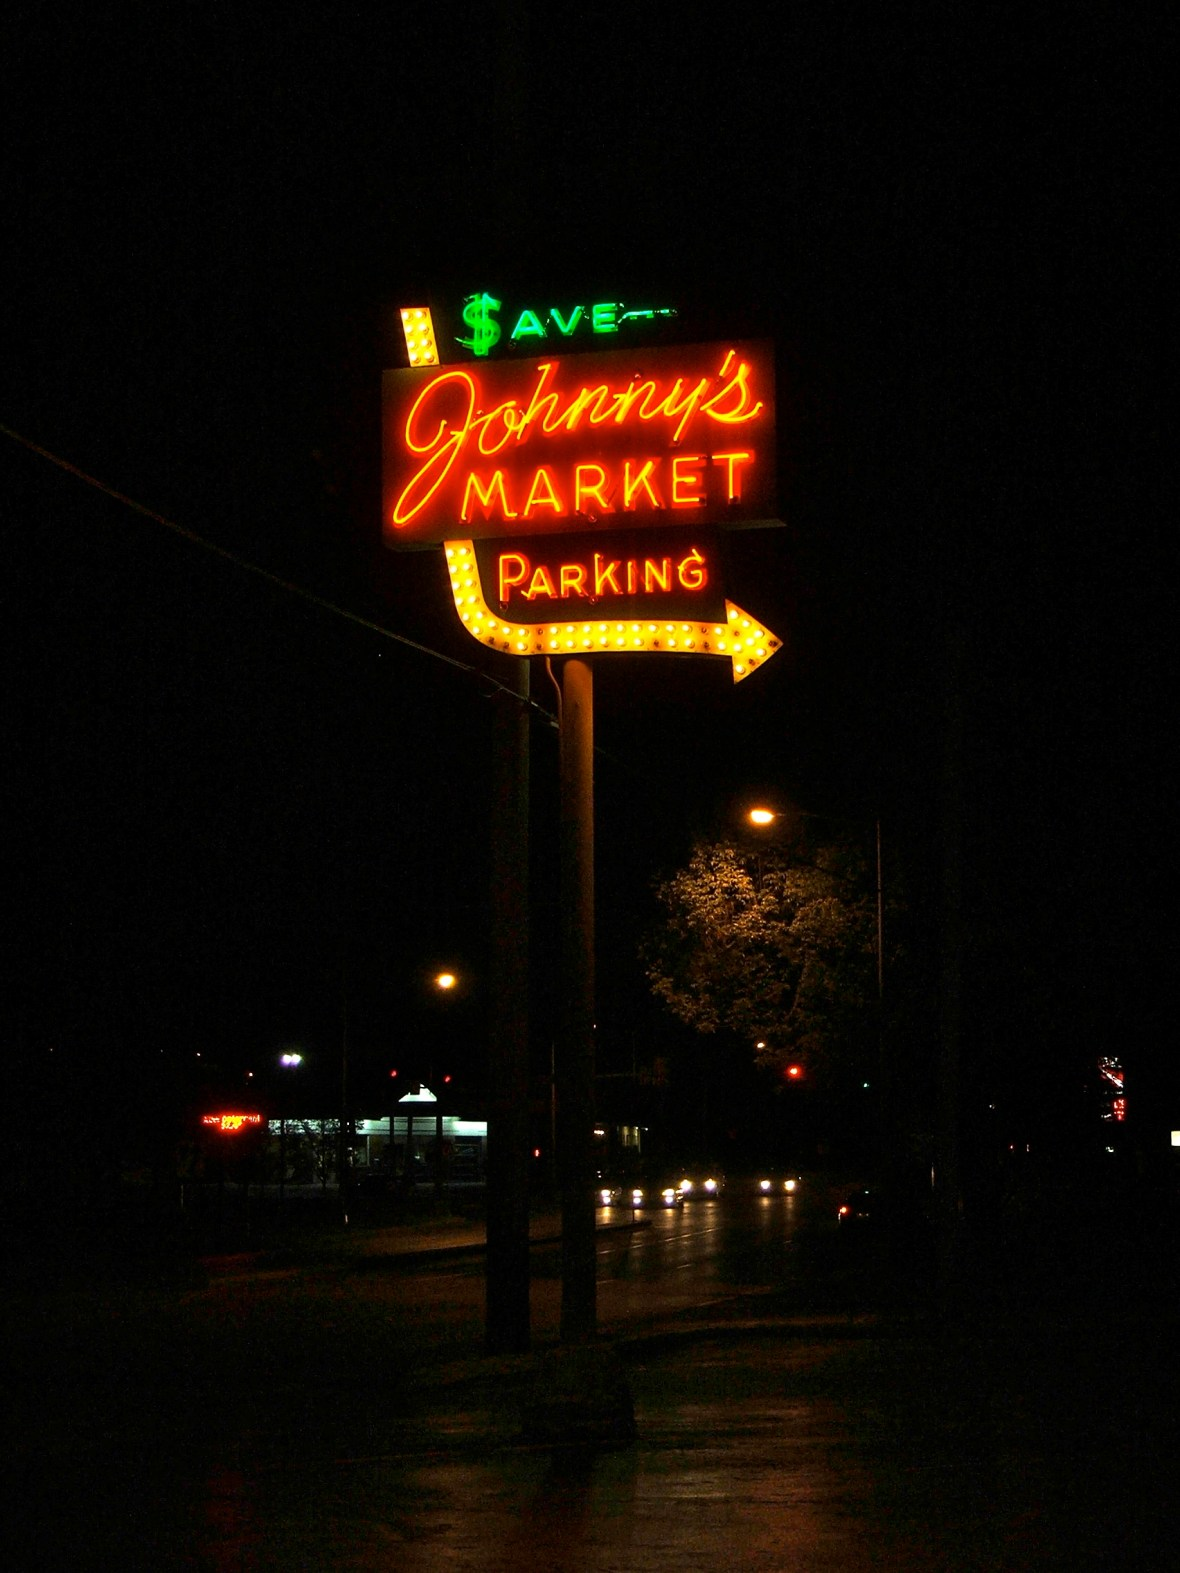 Johnny's Market - 11555 Gravois Roa, Saint Louis, Missouri U.S.A. - May 3, 2008